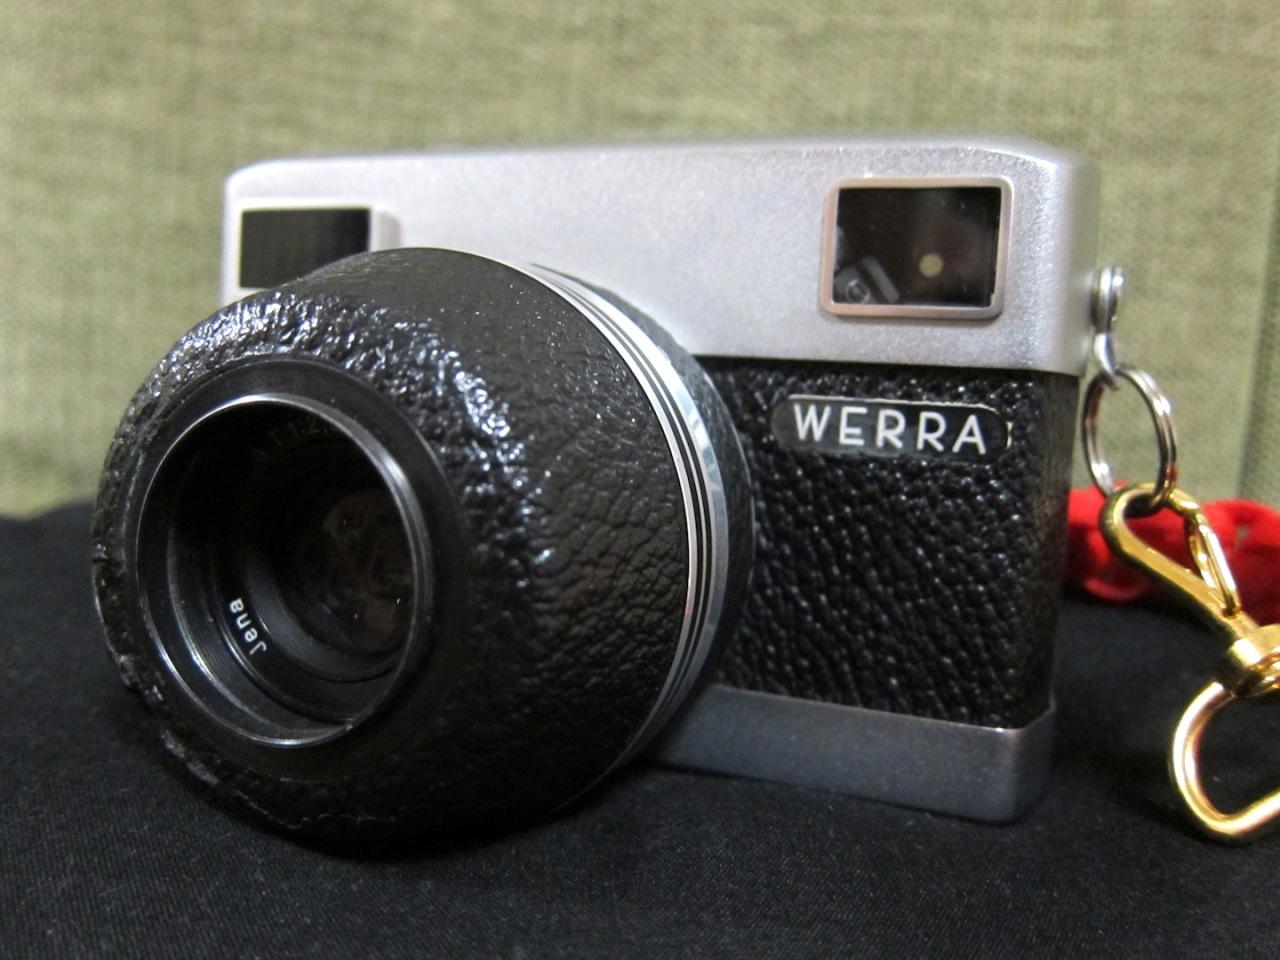 Werra 2B (Werramat)